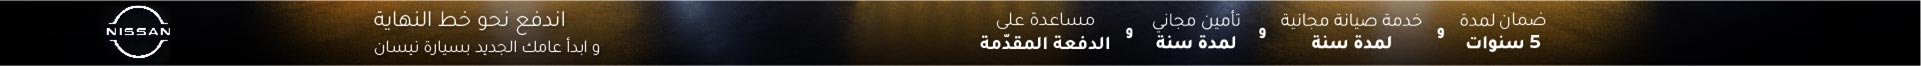 https://ar.nissan-abudhabi.com/offers/yes-offer.html